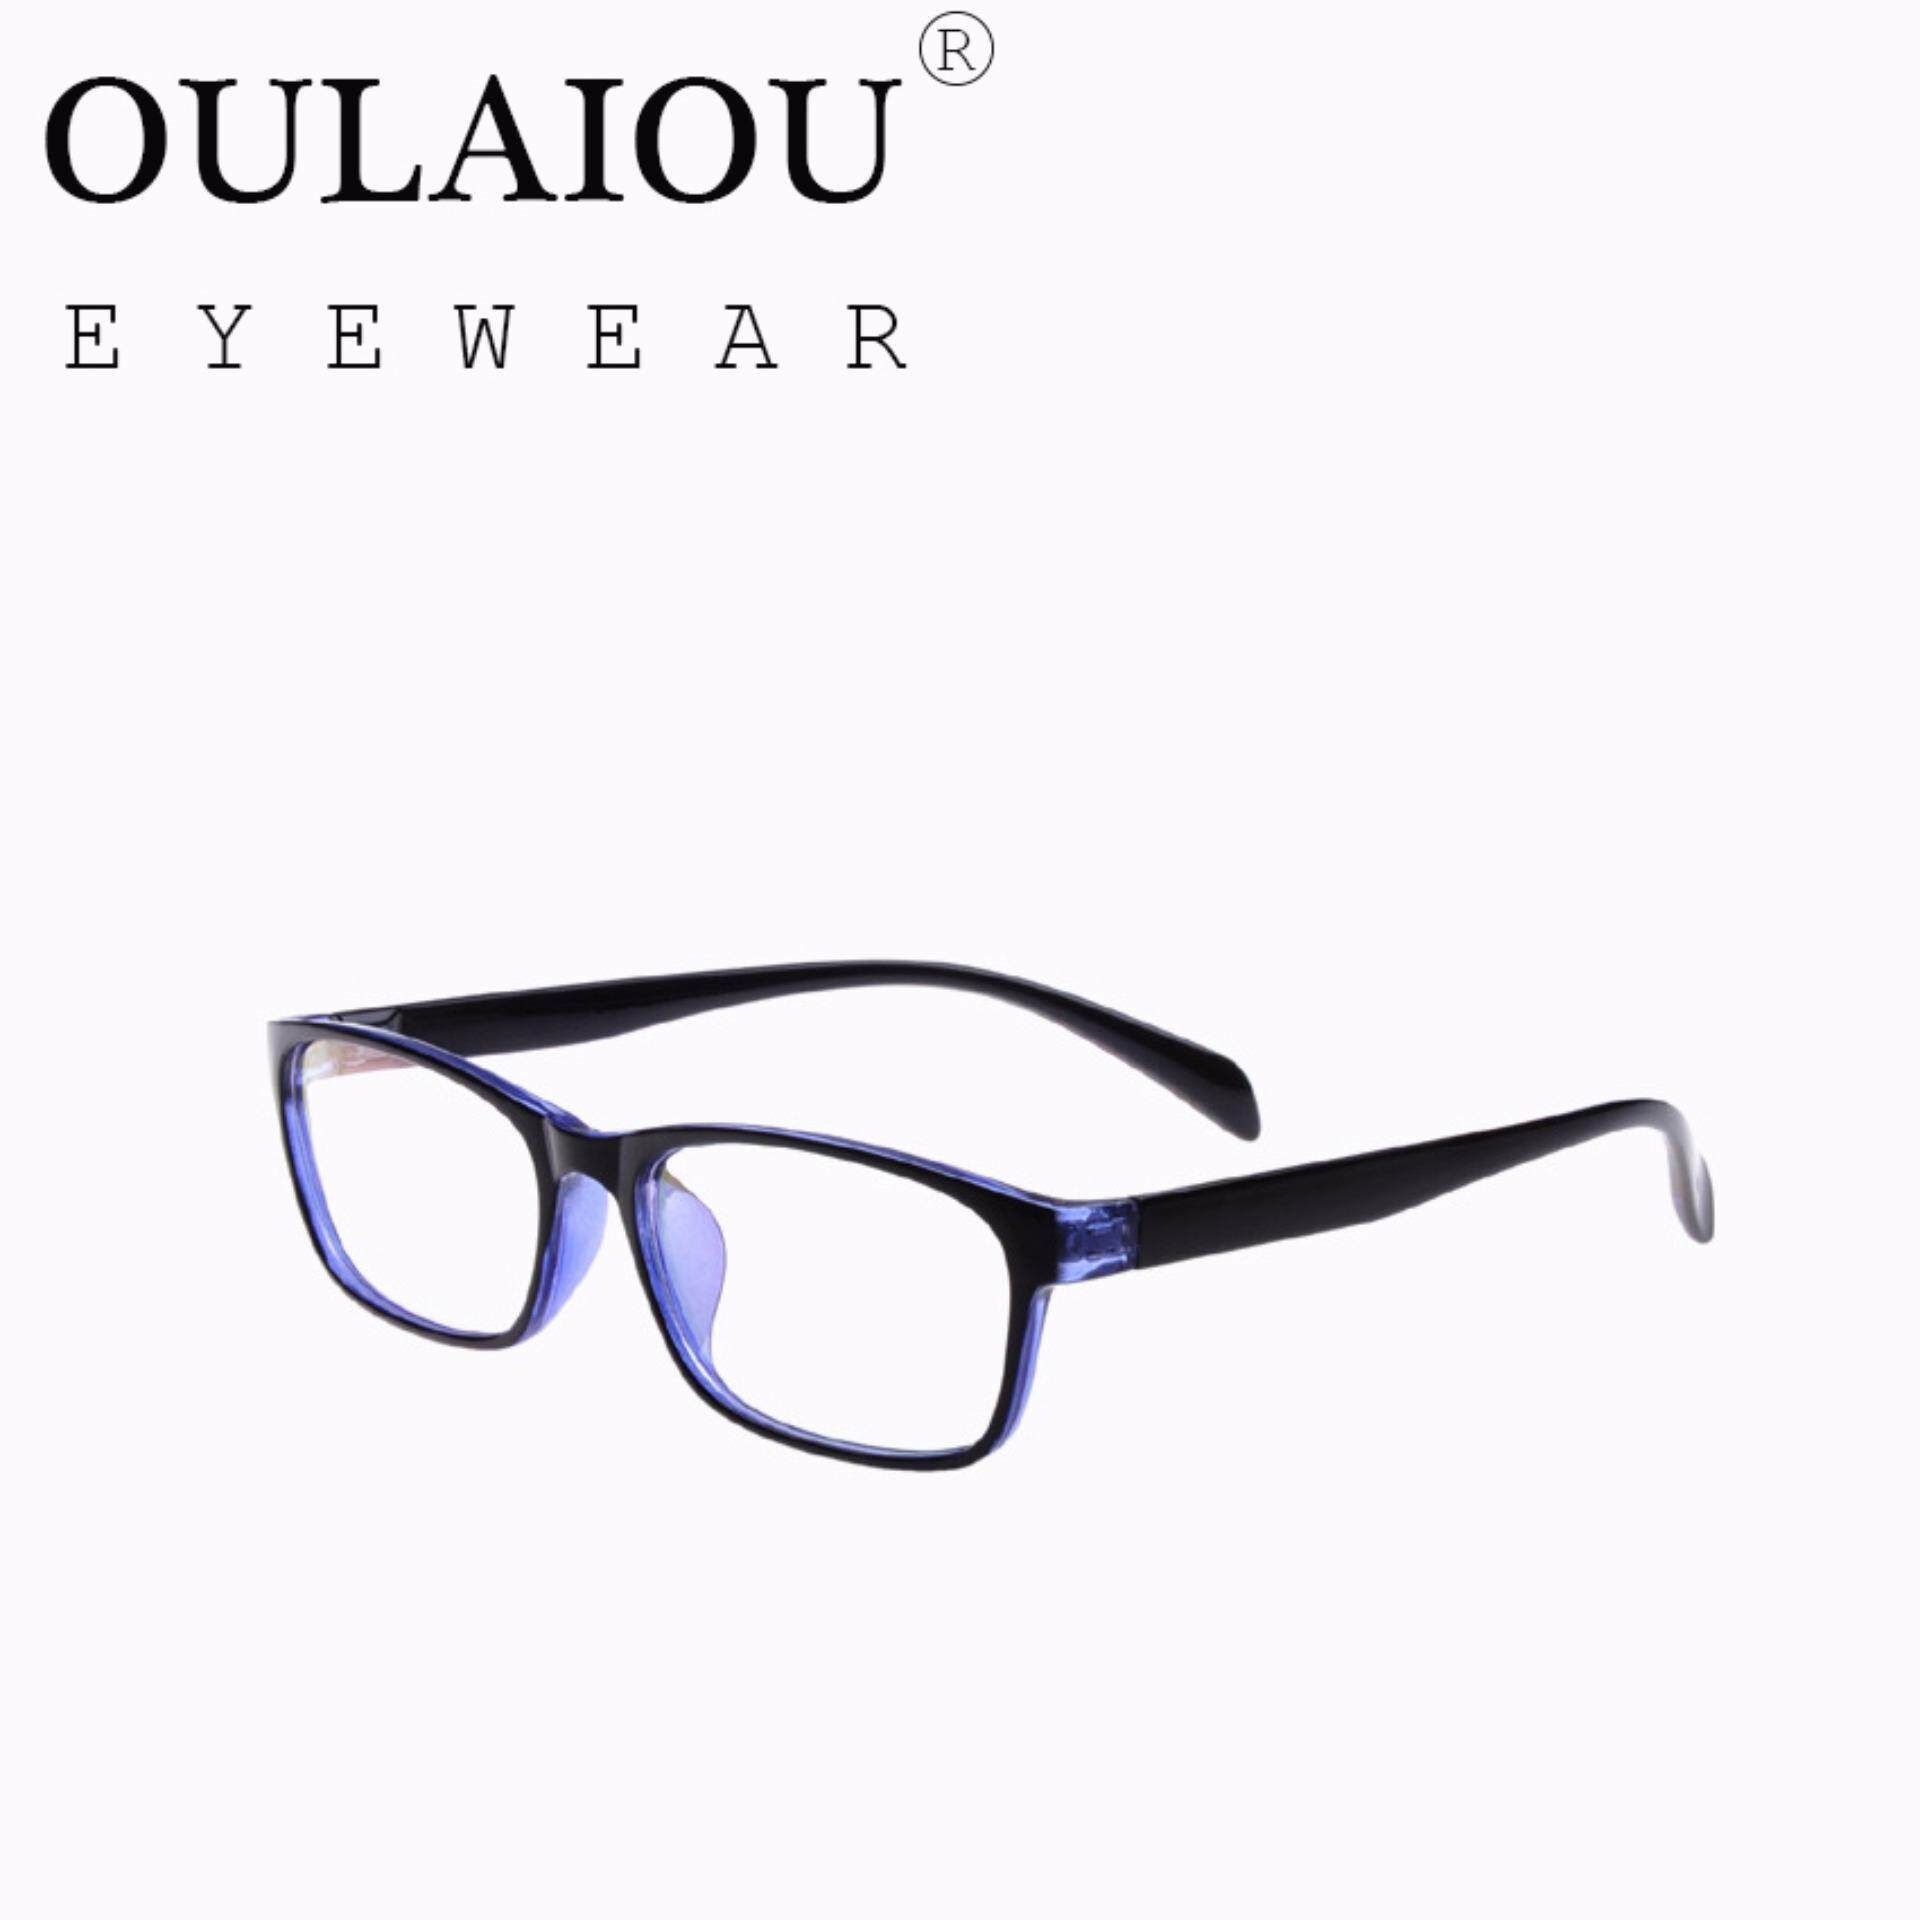 TIANYOU JD Oulaiou Fashion Accessories Anti-fatigue Trendy Eyewear Reading Glasses OJ613